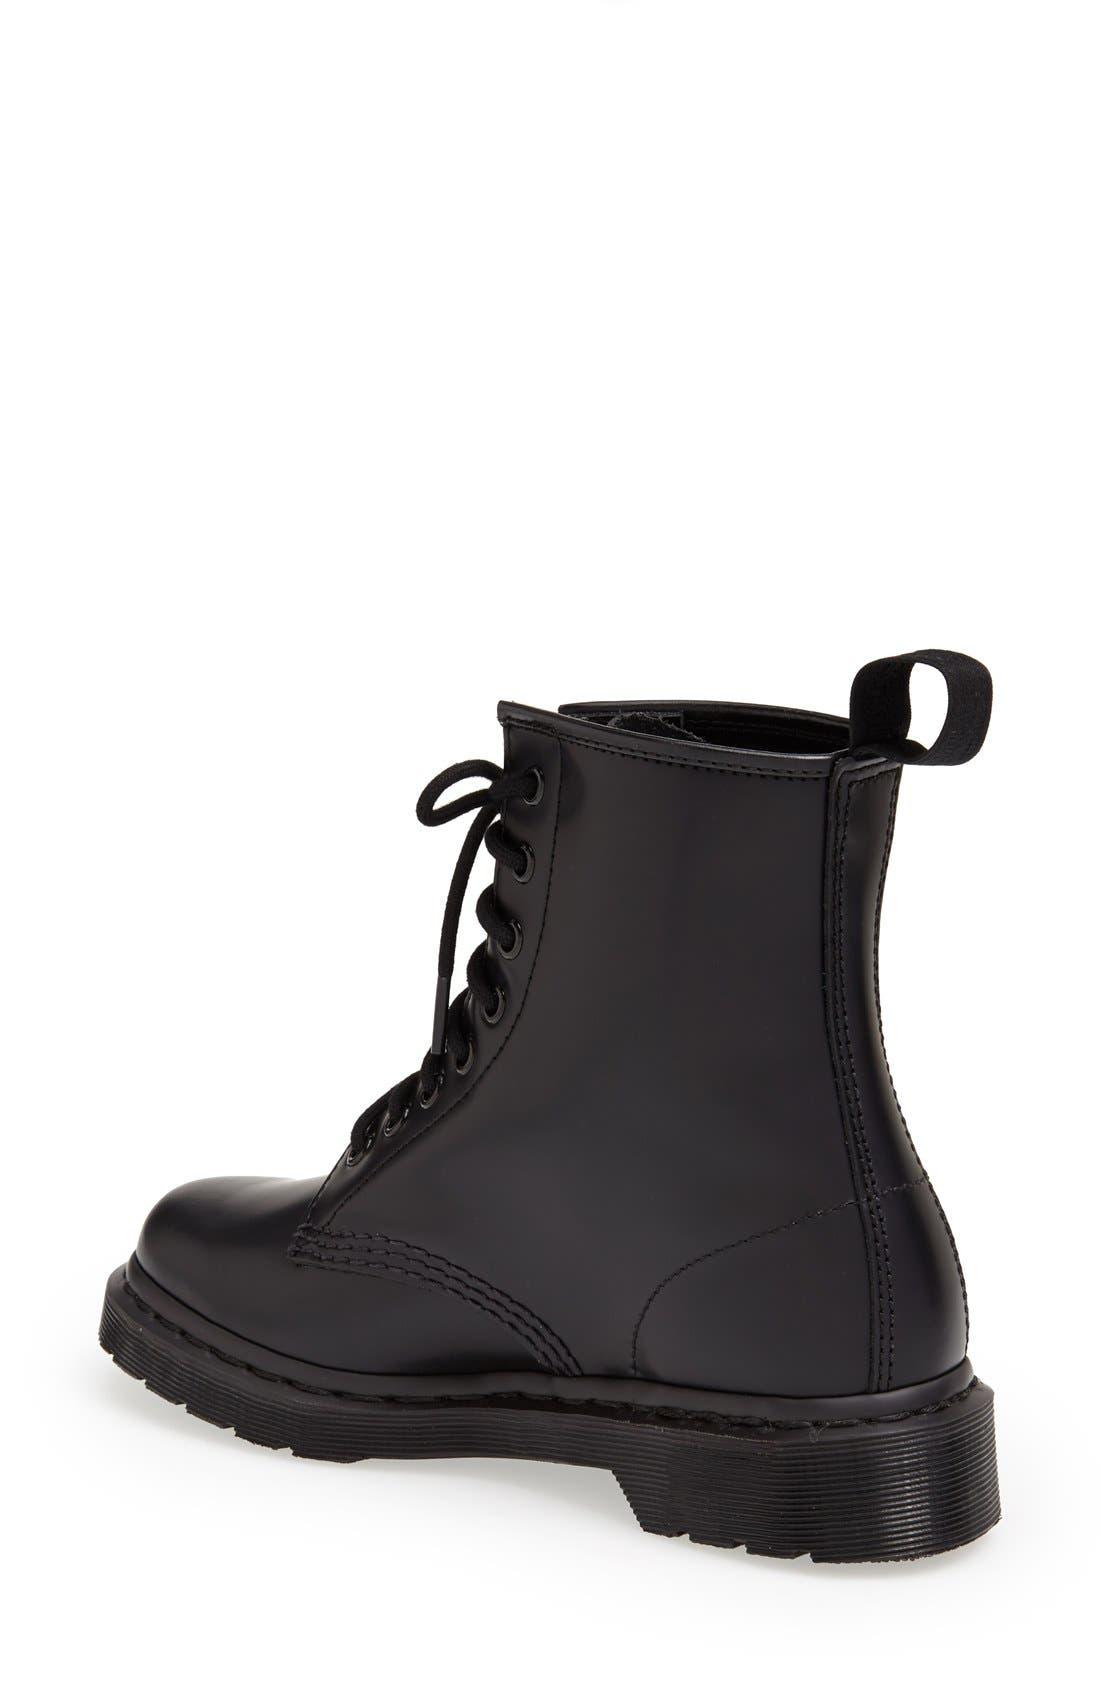 Alternate Image 2  - Dr. Martens '1460 Mono' Boot (Women)